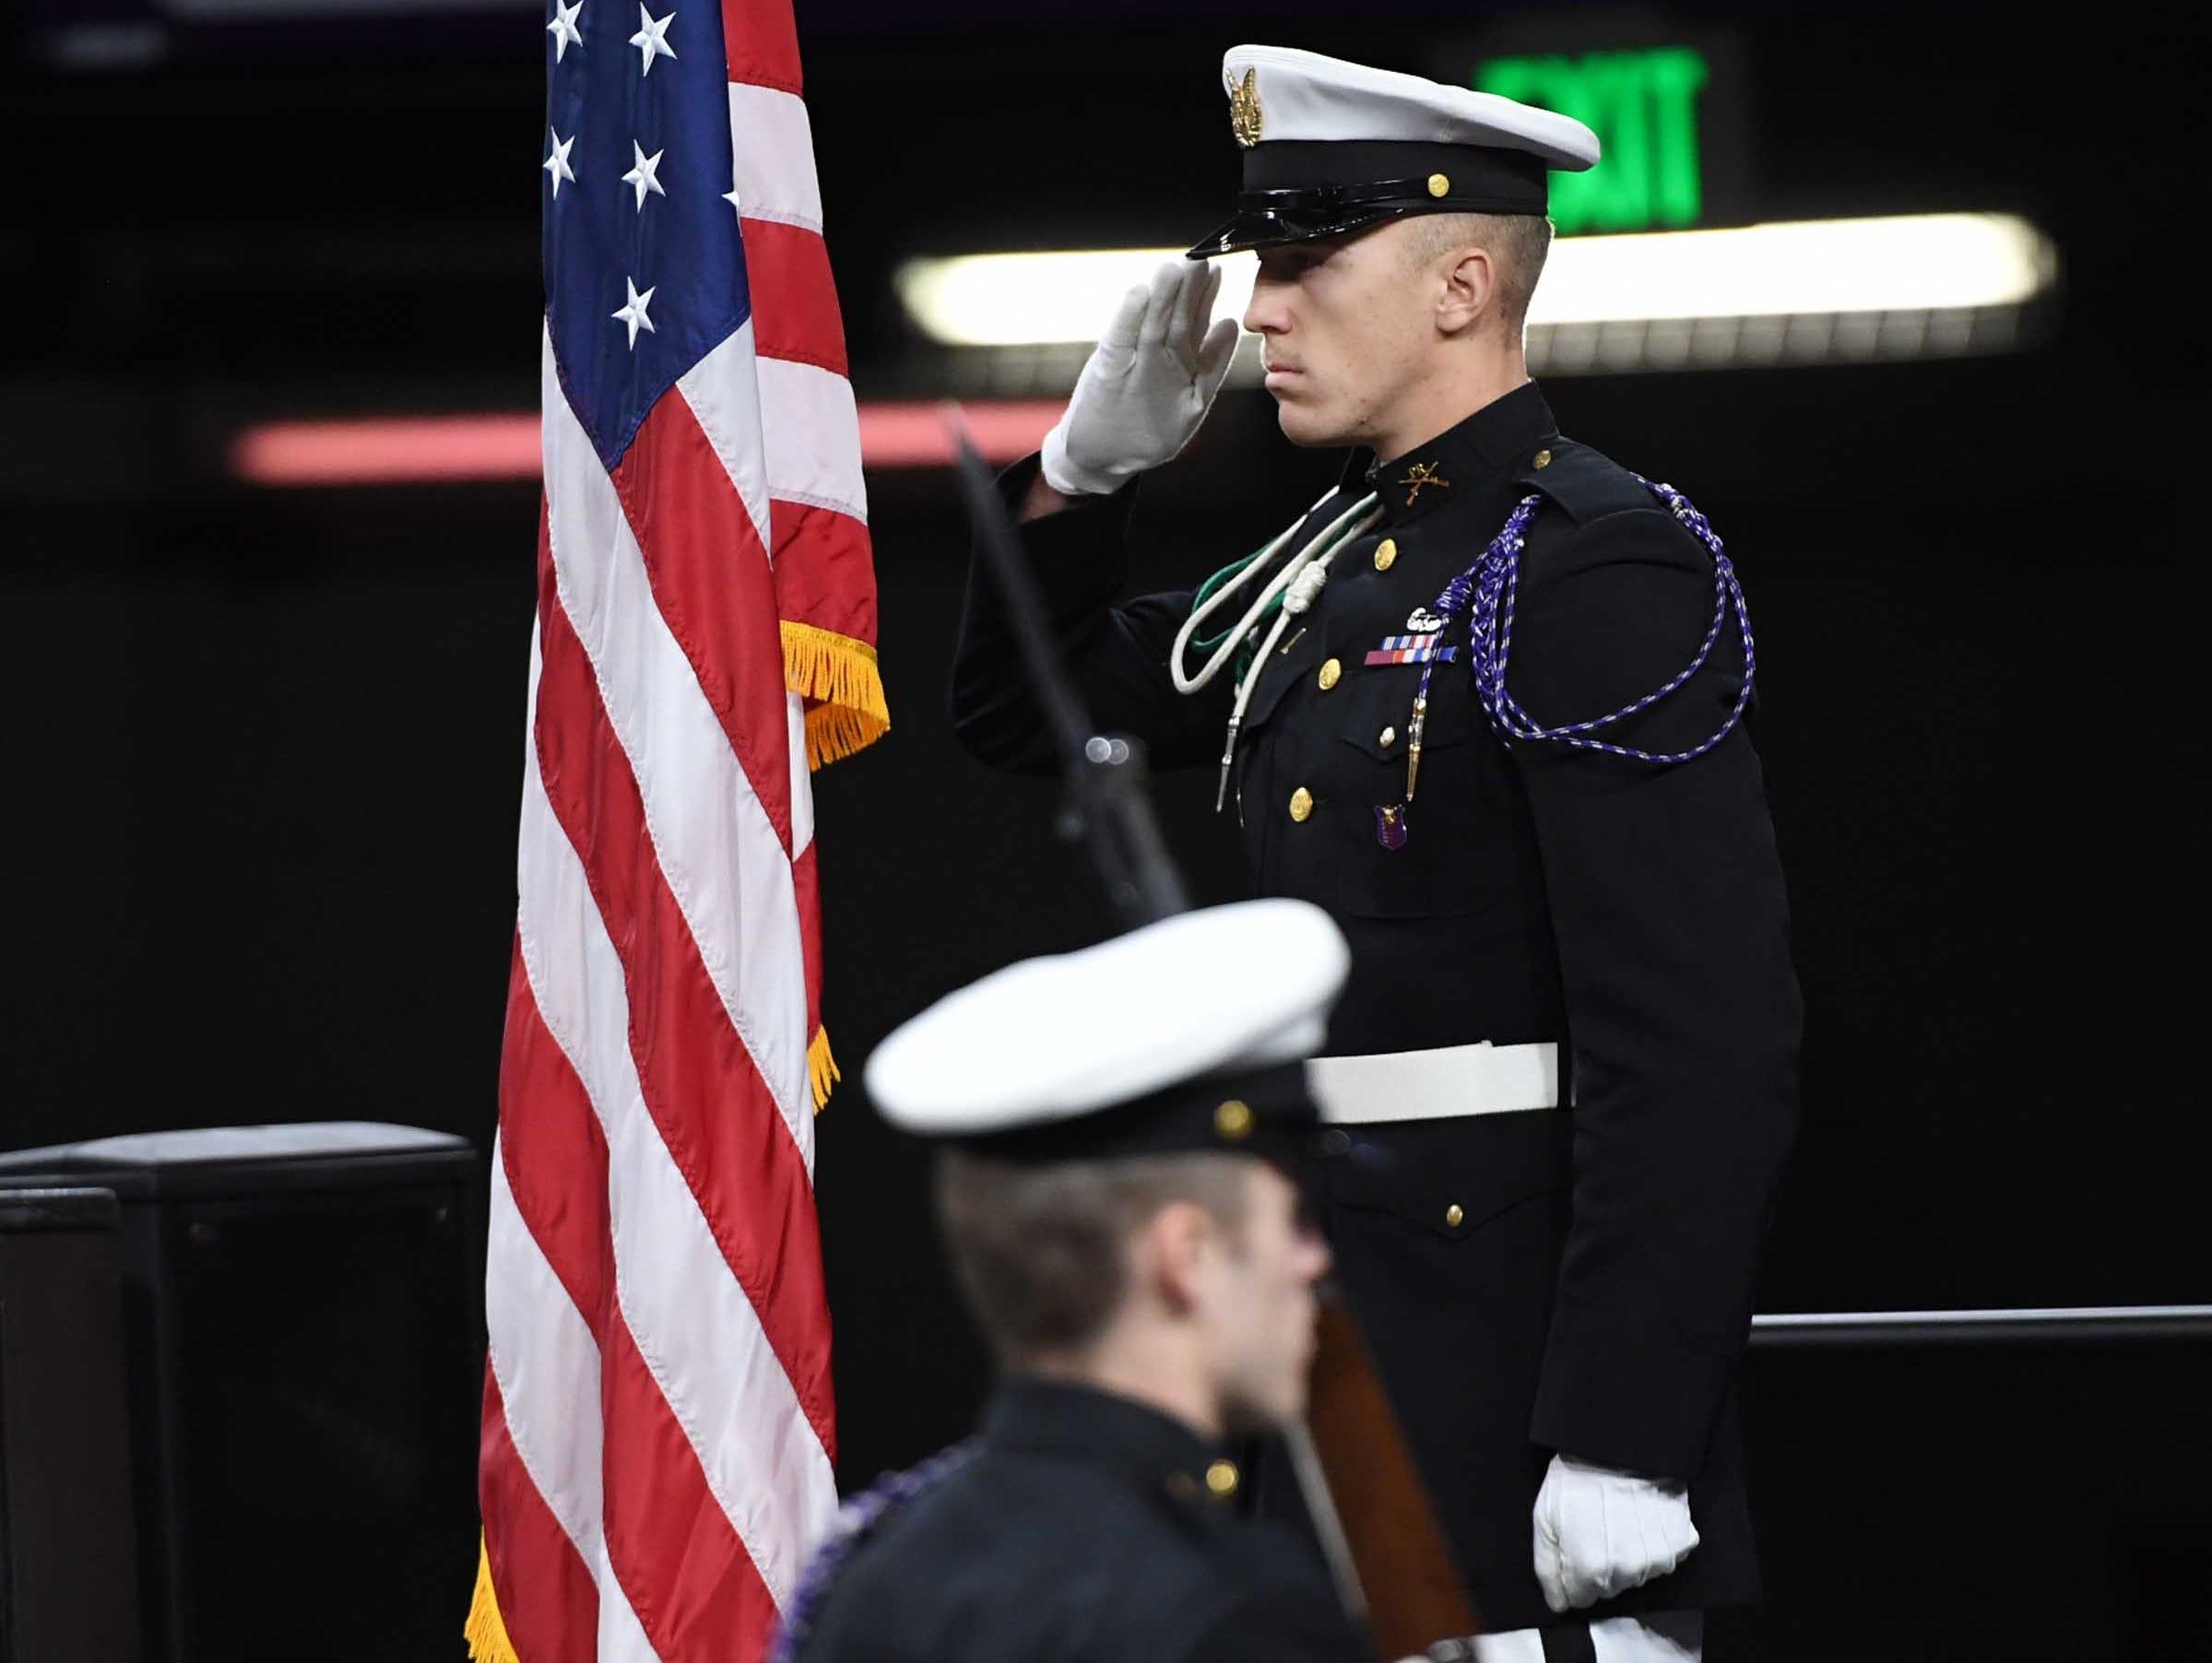 Clemson University Pershing Rifles C-4 post colors for the National Anthem during Clemson University graduation ceremony Thursday morning in Littlejohn Coliseum in Clemson.